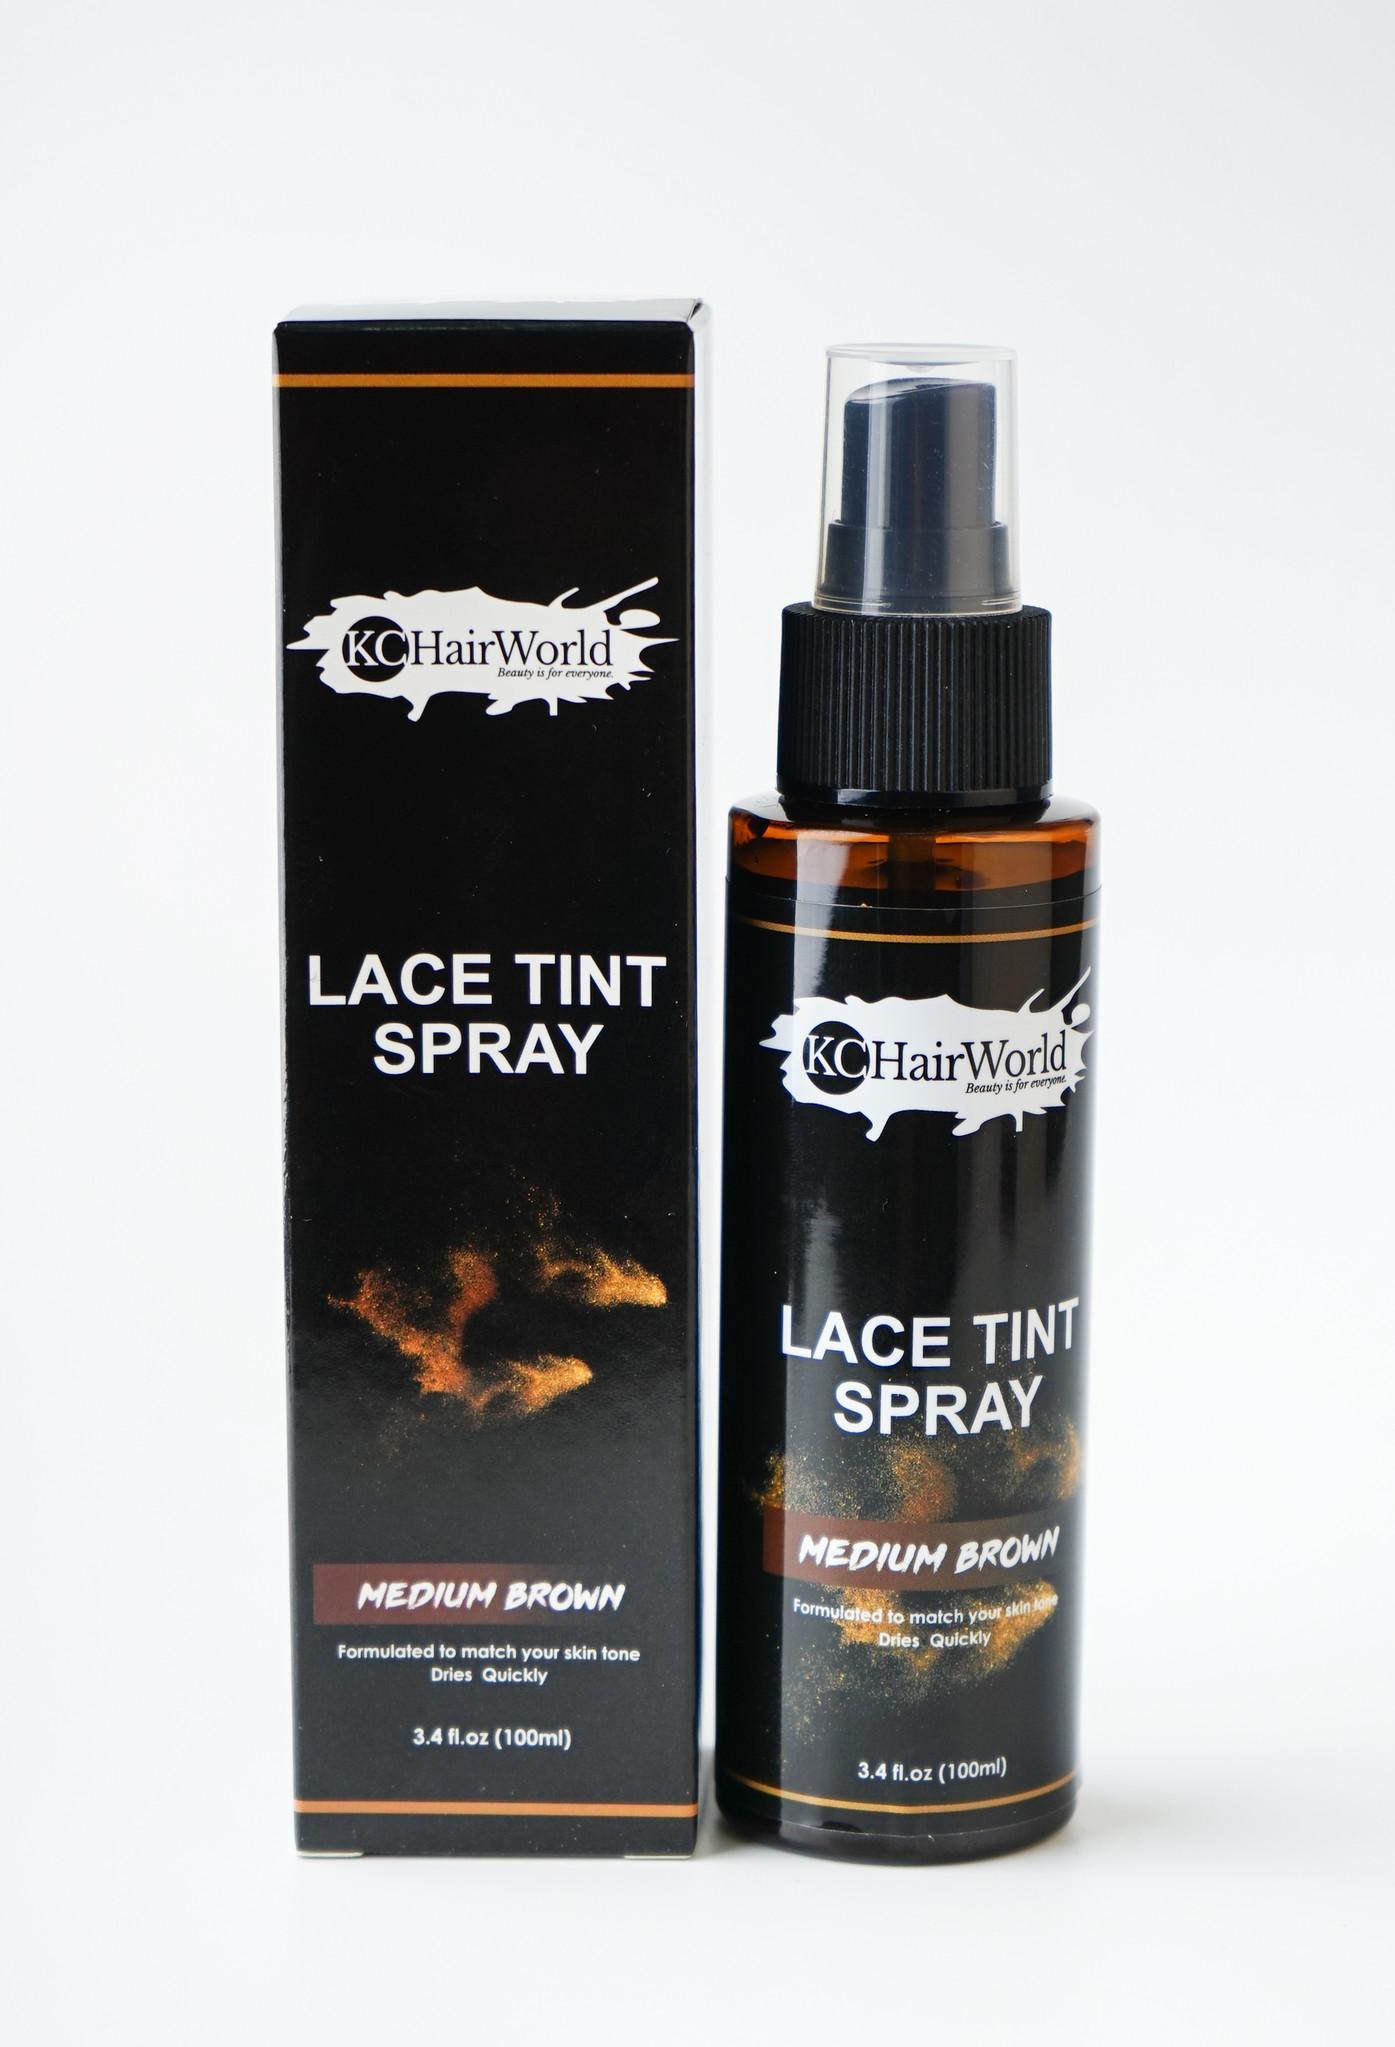 Lace Tint Spray - Medium Brown